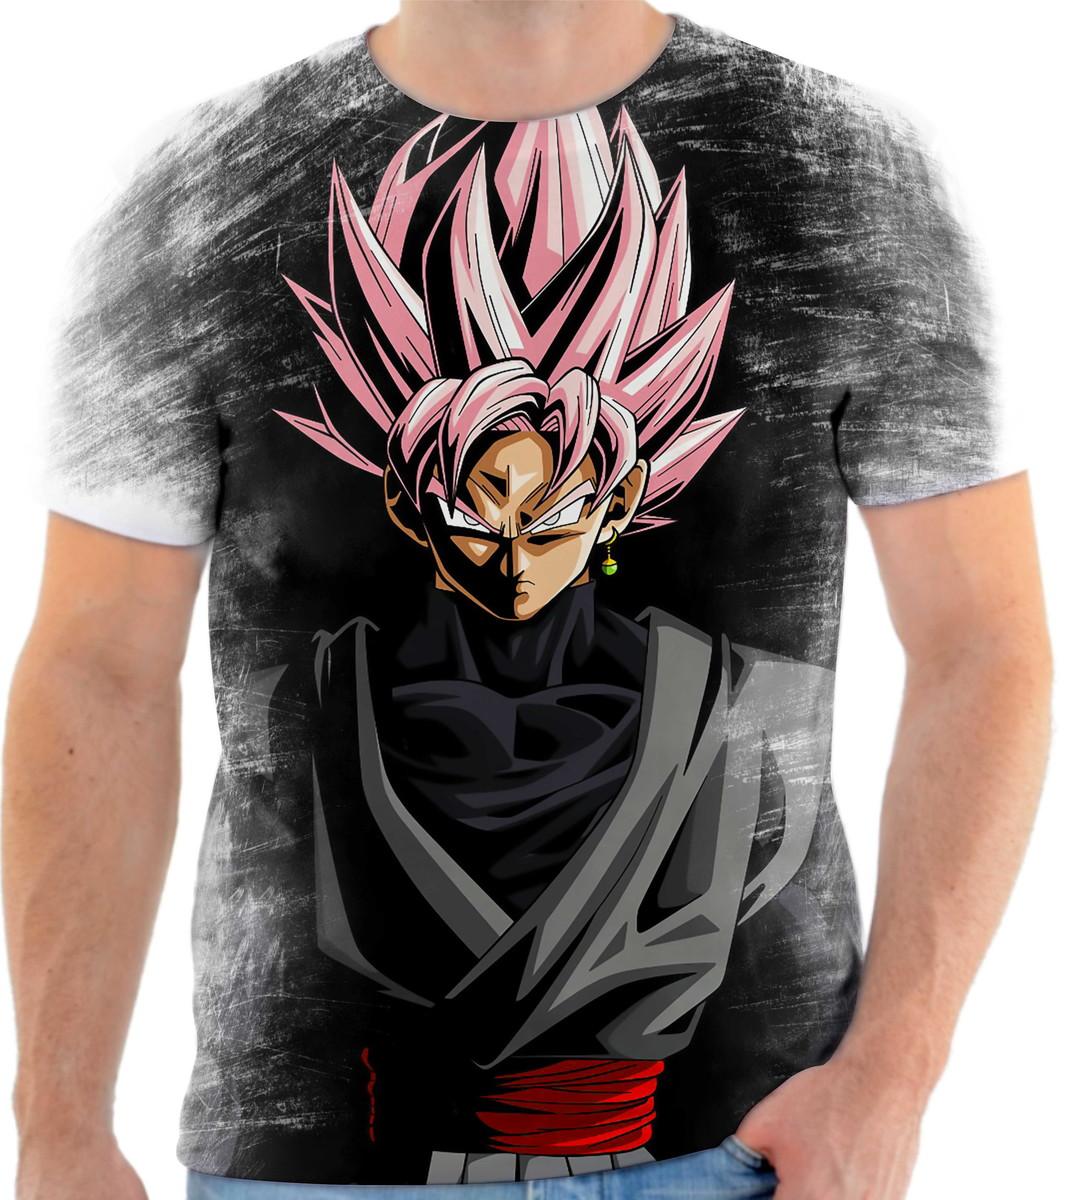 2a074c963 Camiseta Anime Dragon Ball Super Goku Black Full HD 01 no Elo7 ...